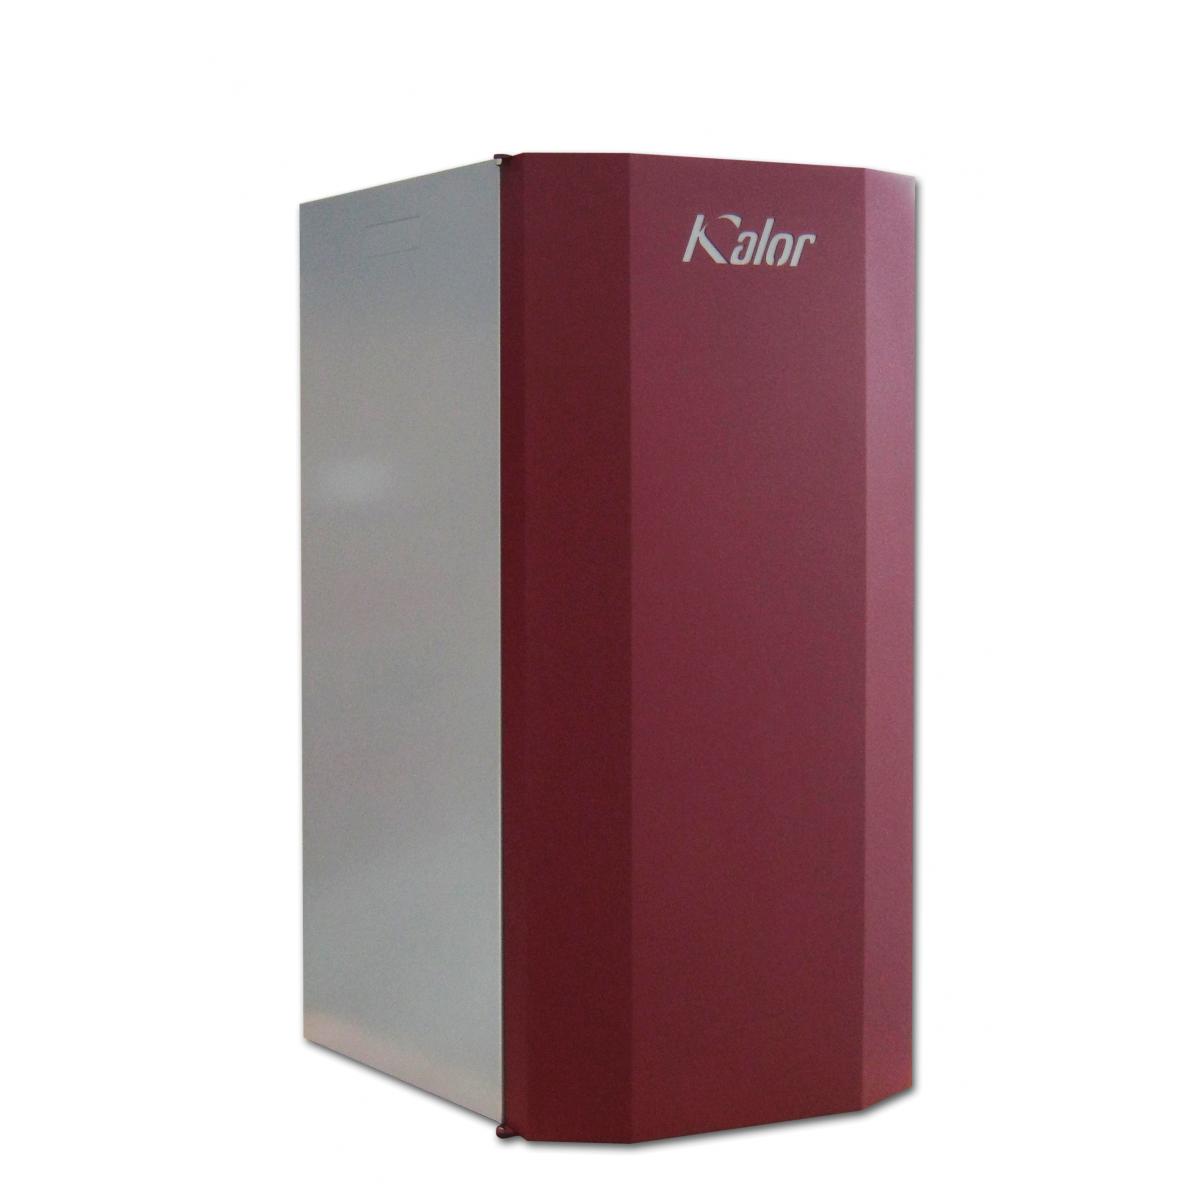 Caldaia idro a pellet Kalor 20 kw per riscaldamento radiatori hydro